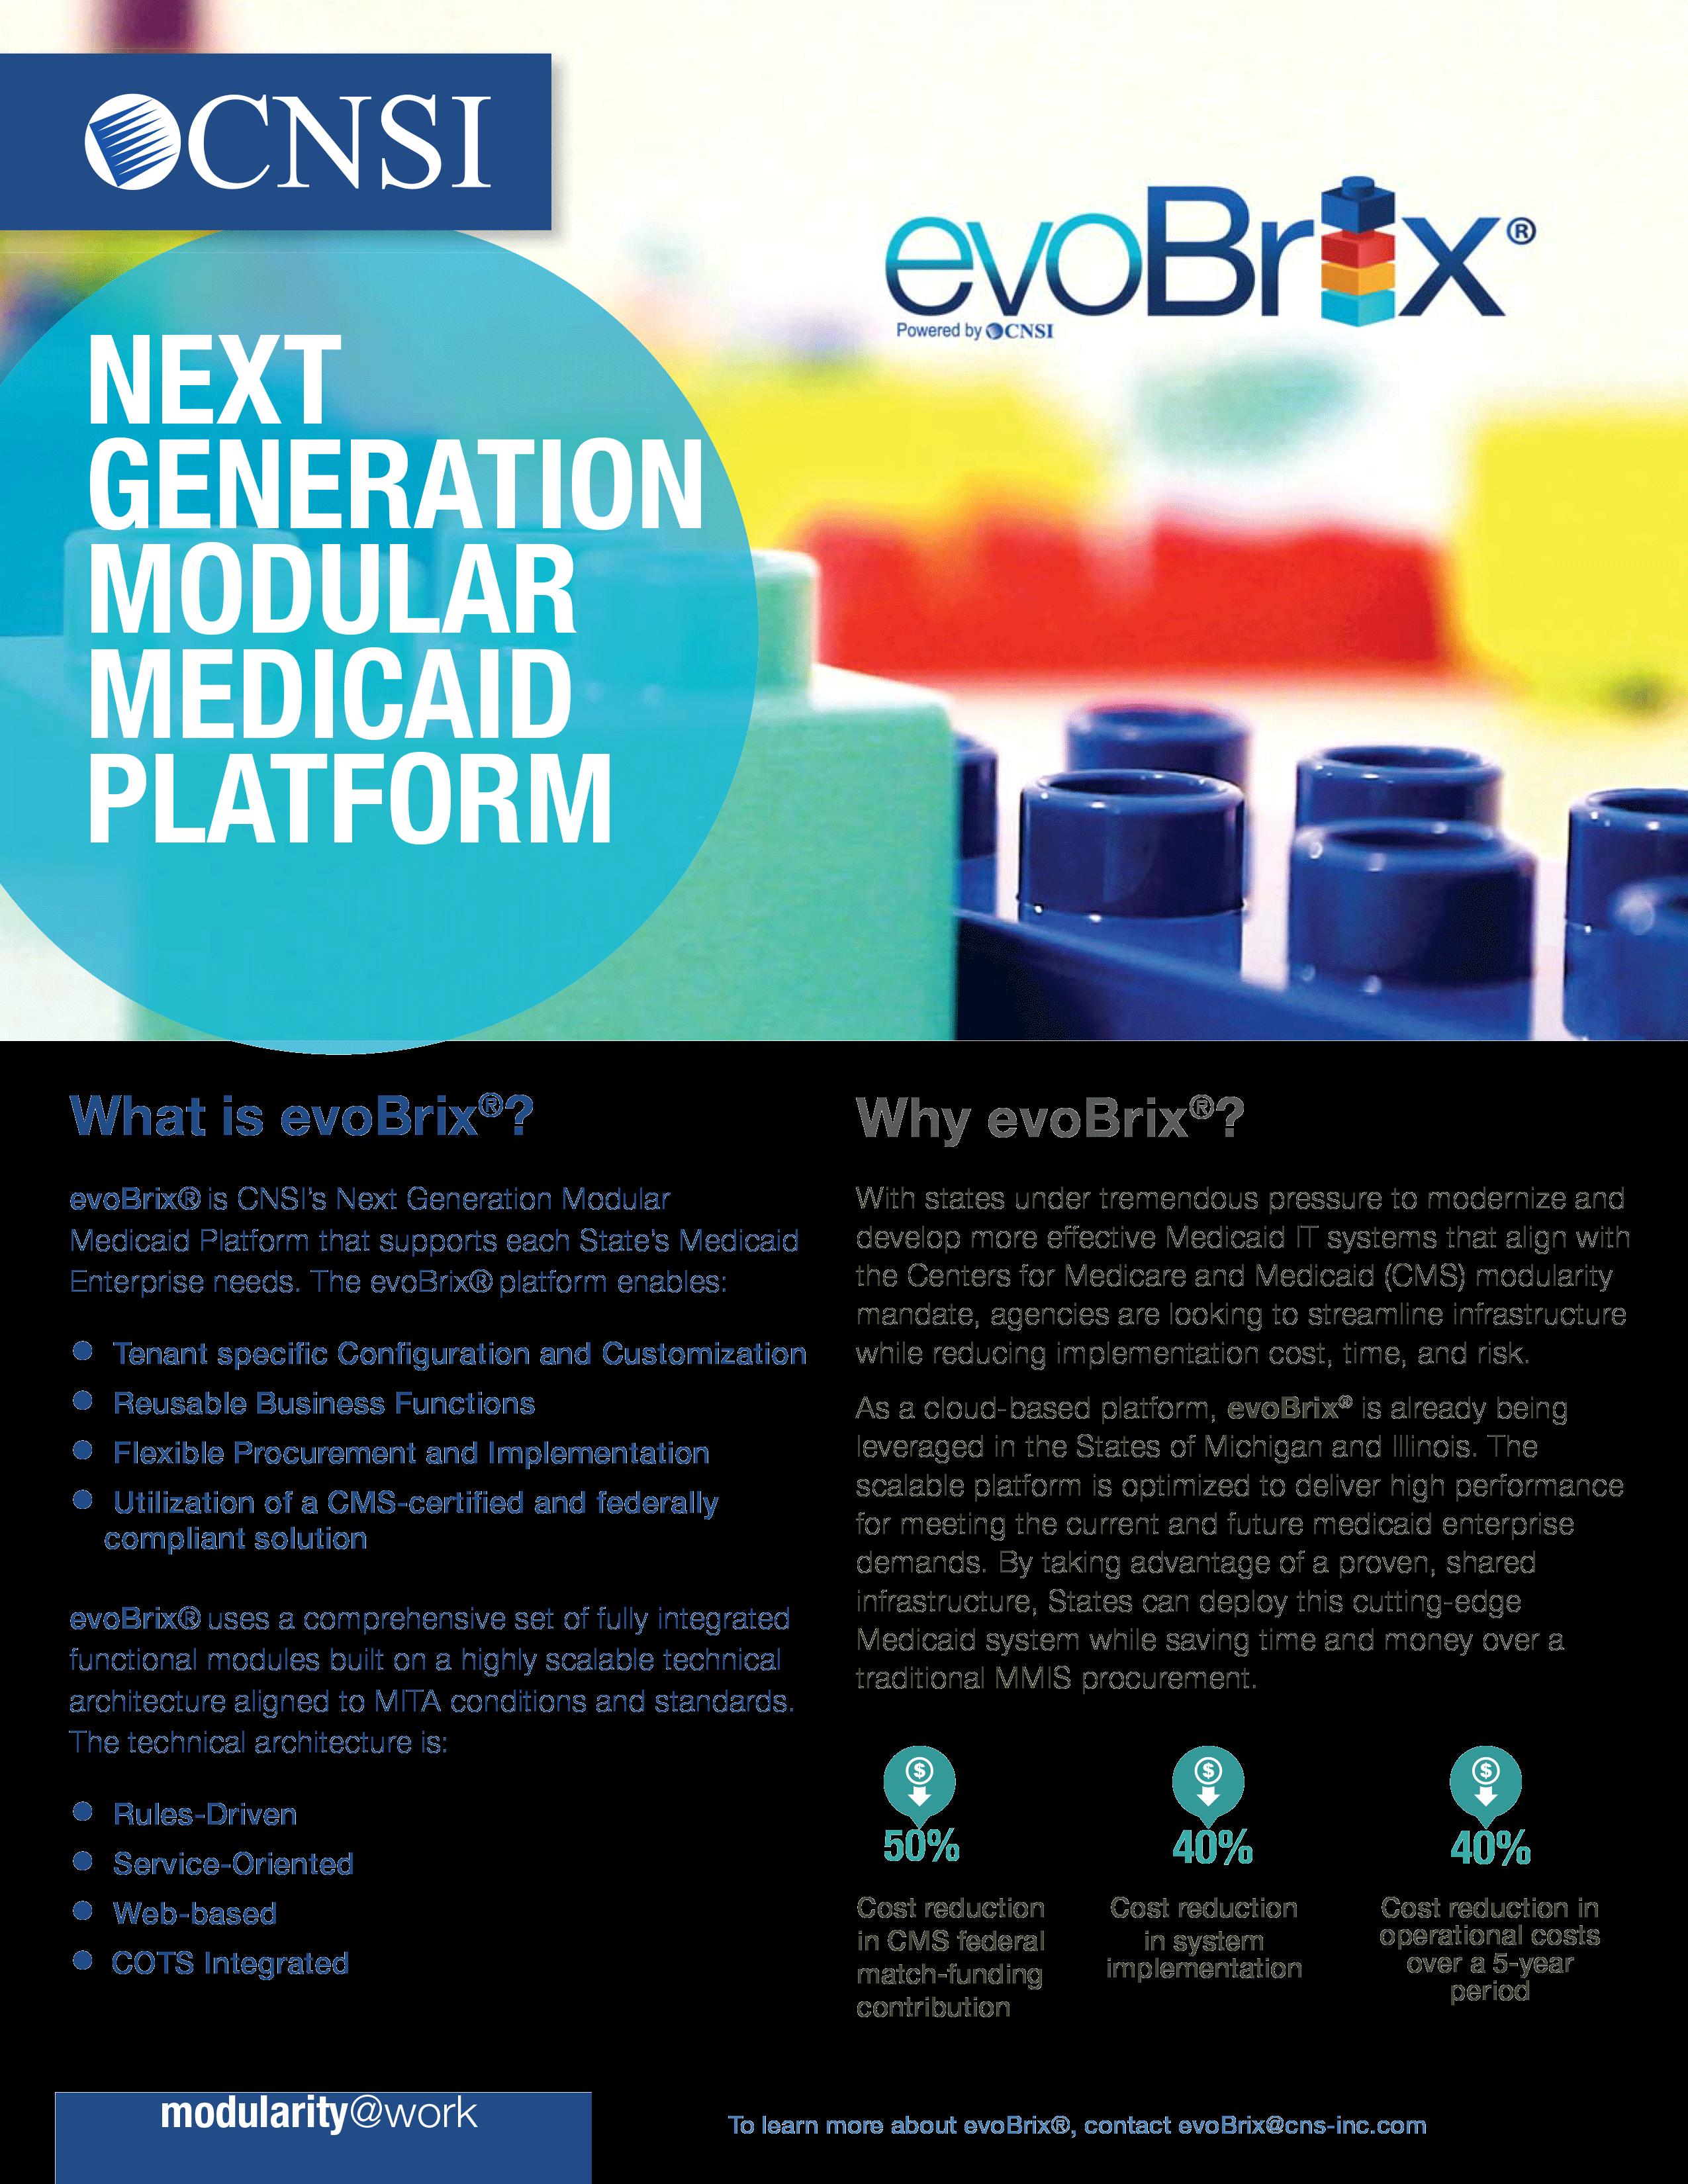 evoBrix®: Next Generation Modular Medicaid Platform